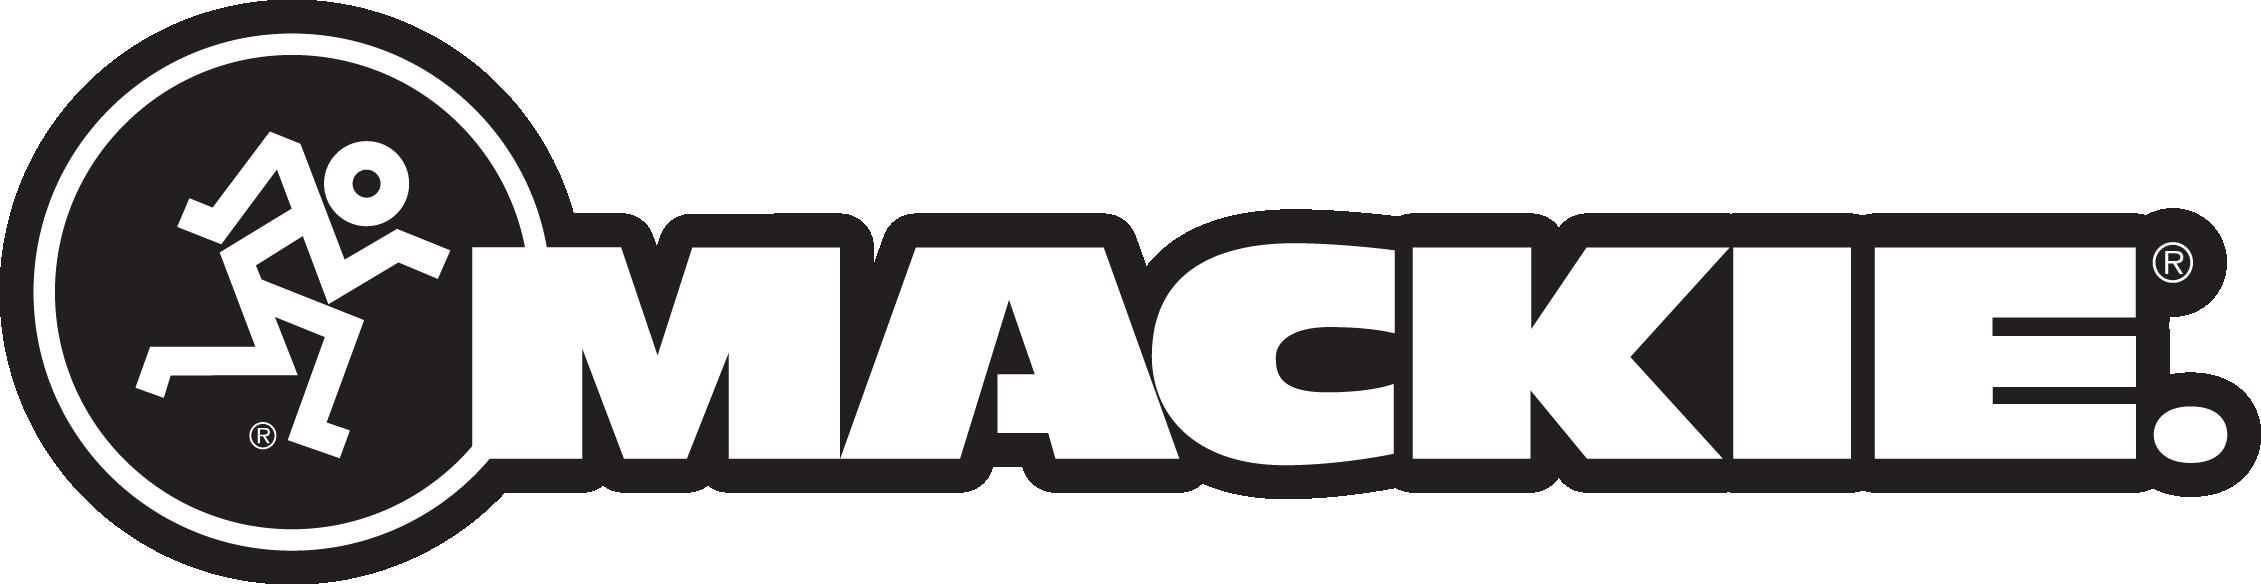 Mackie_Combo_logo-black-outline.png